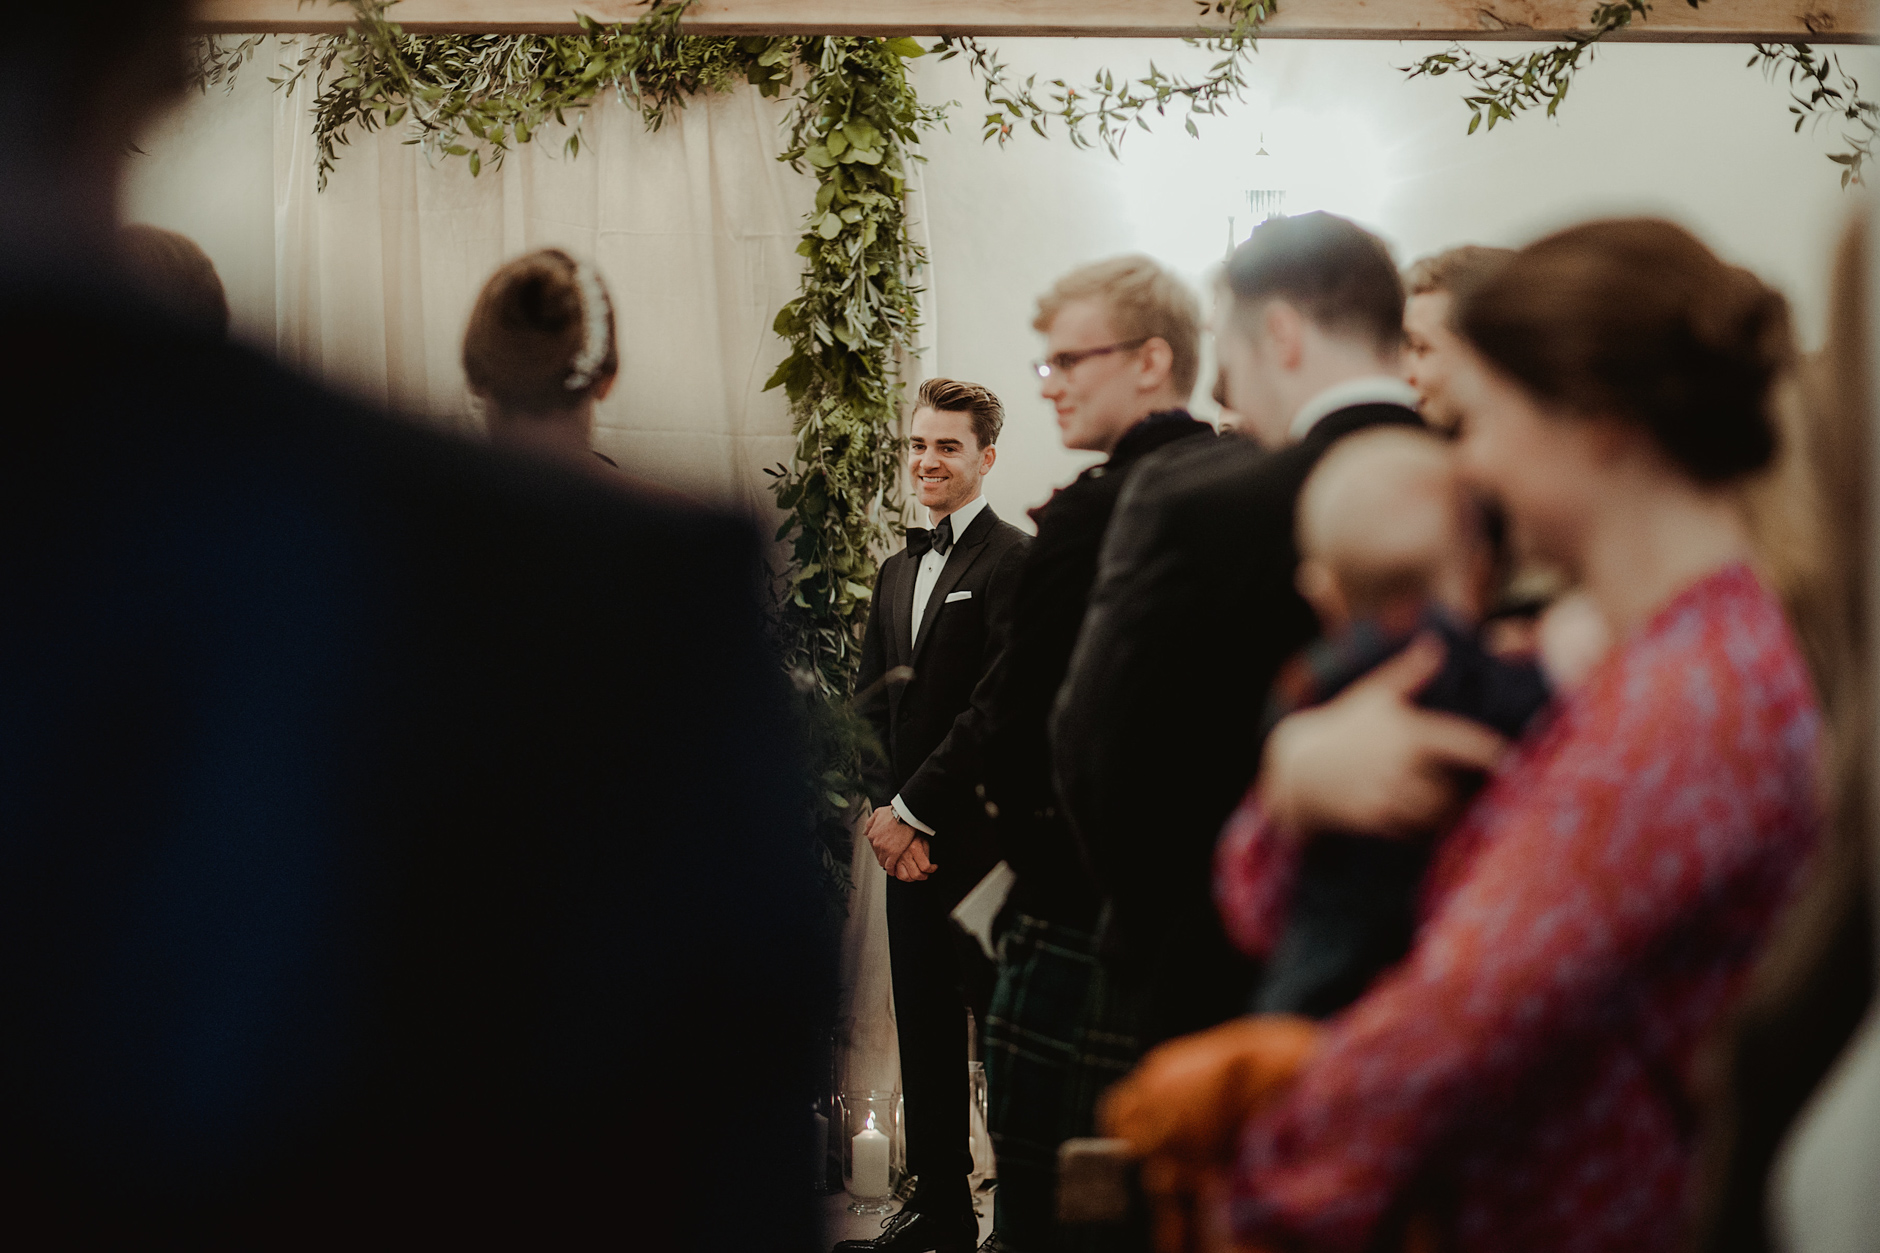 Glentruim-Wedding-Nikki-Leadbetter-Photography-83.jpg